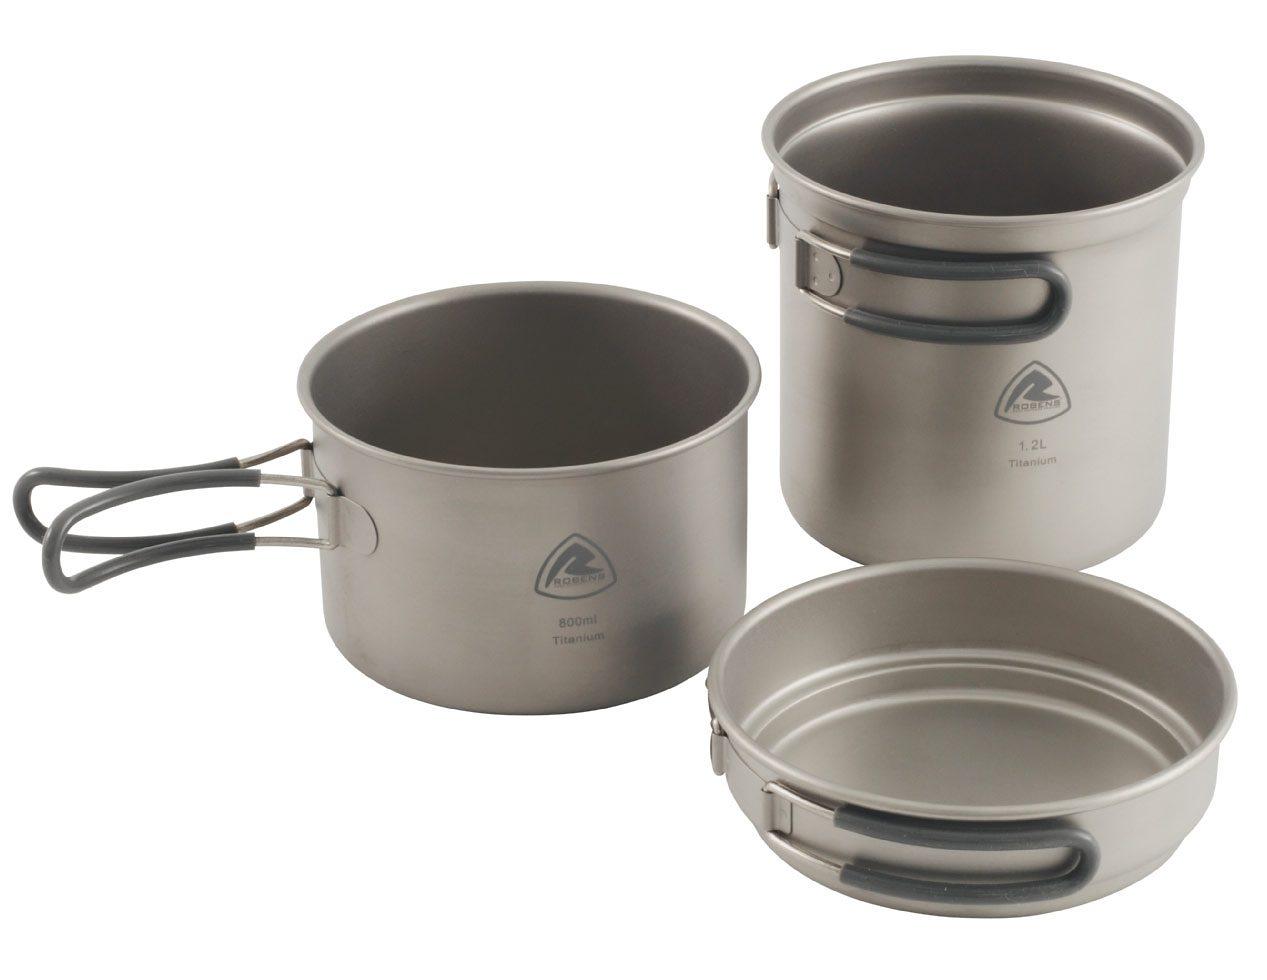 Robens Camping-Geschirr »Titanium Cook Set«